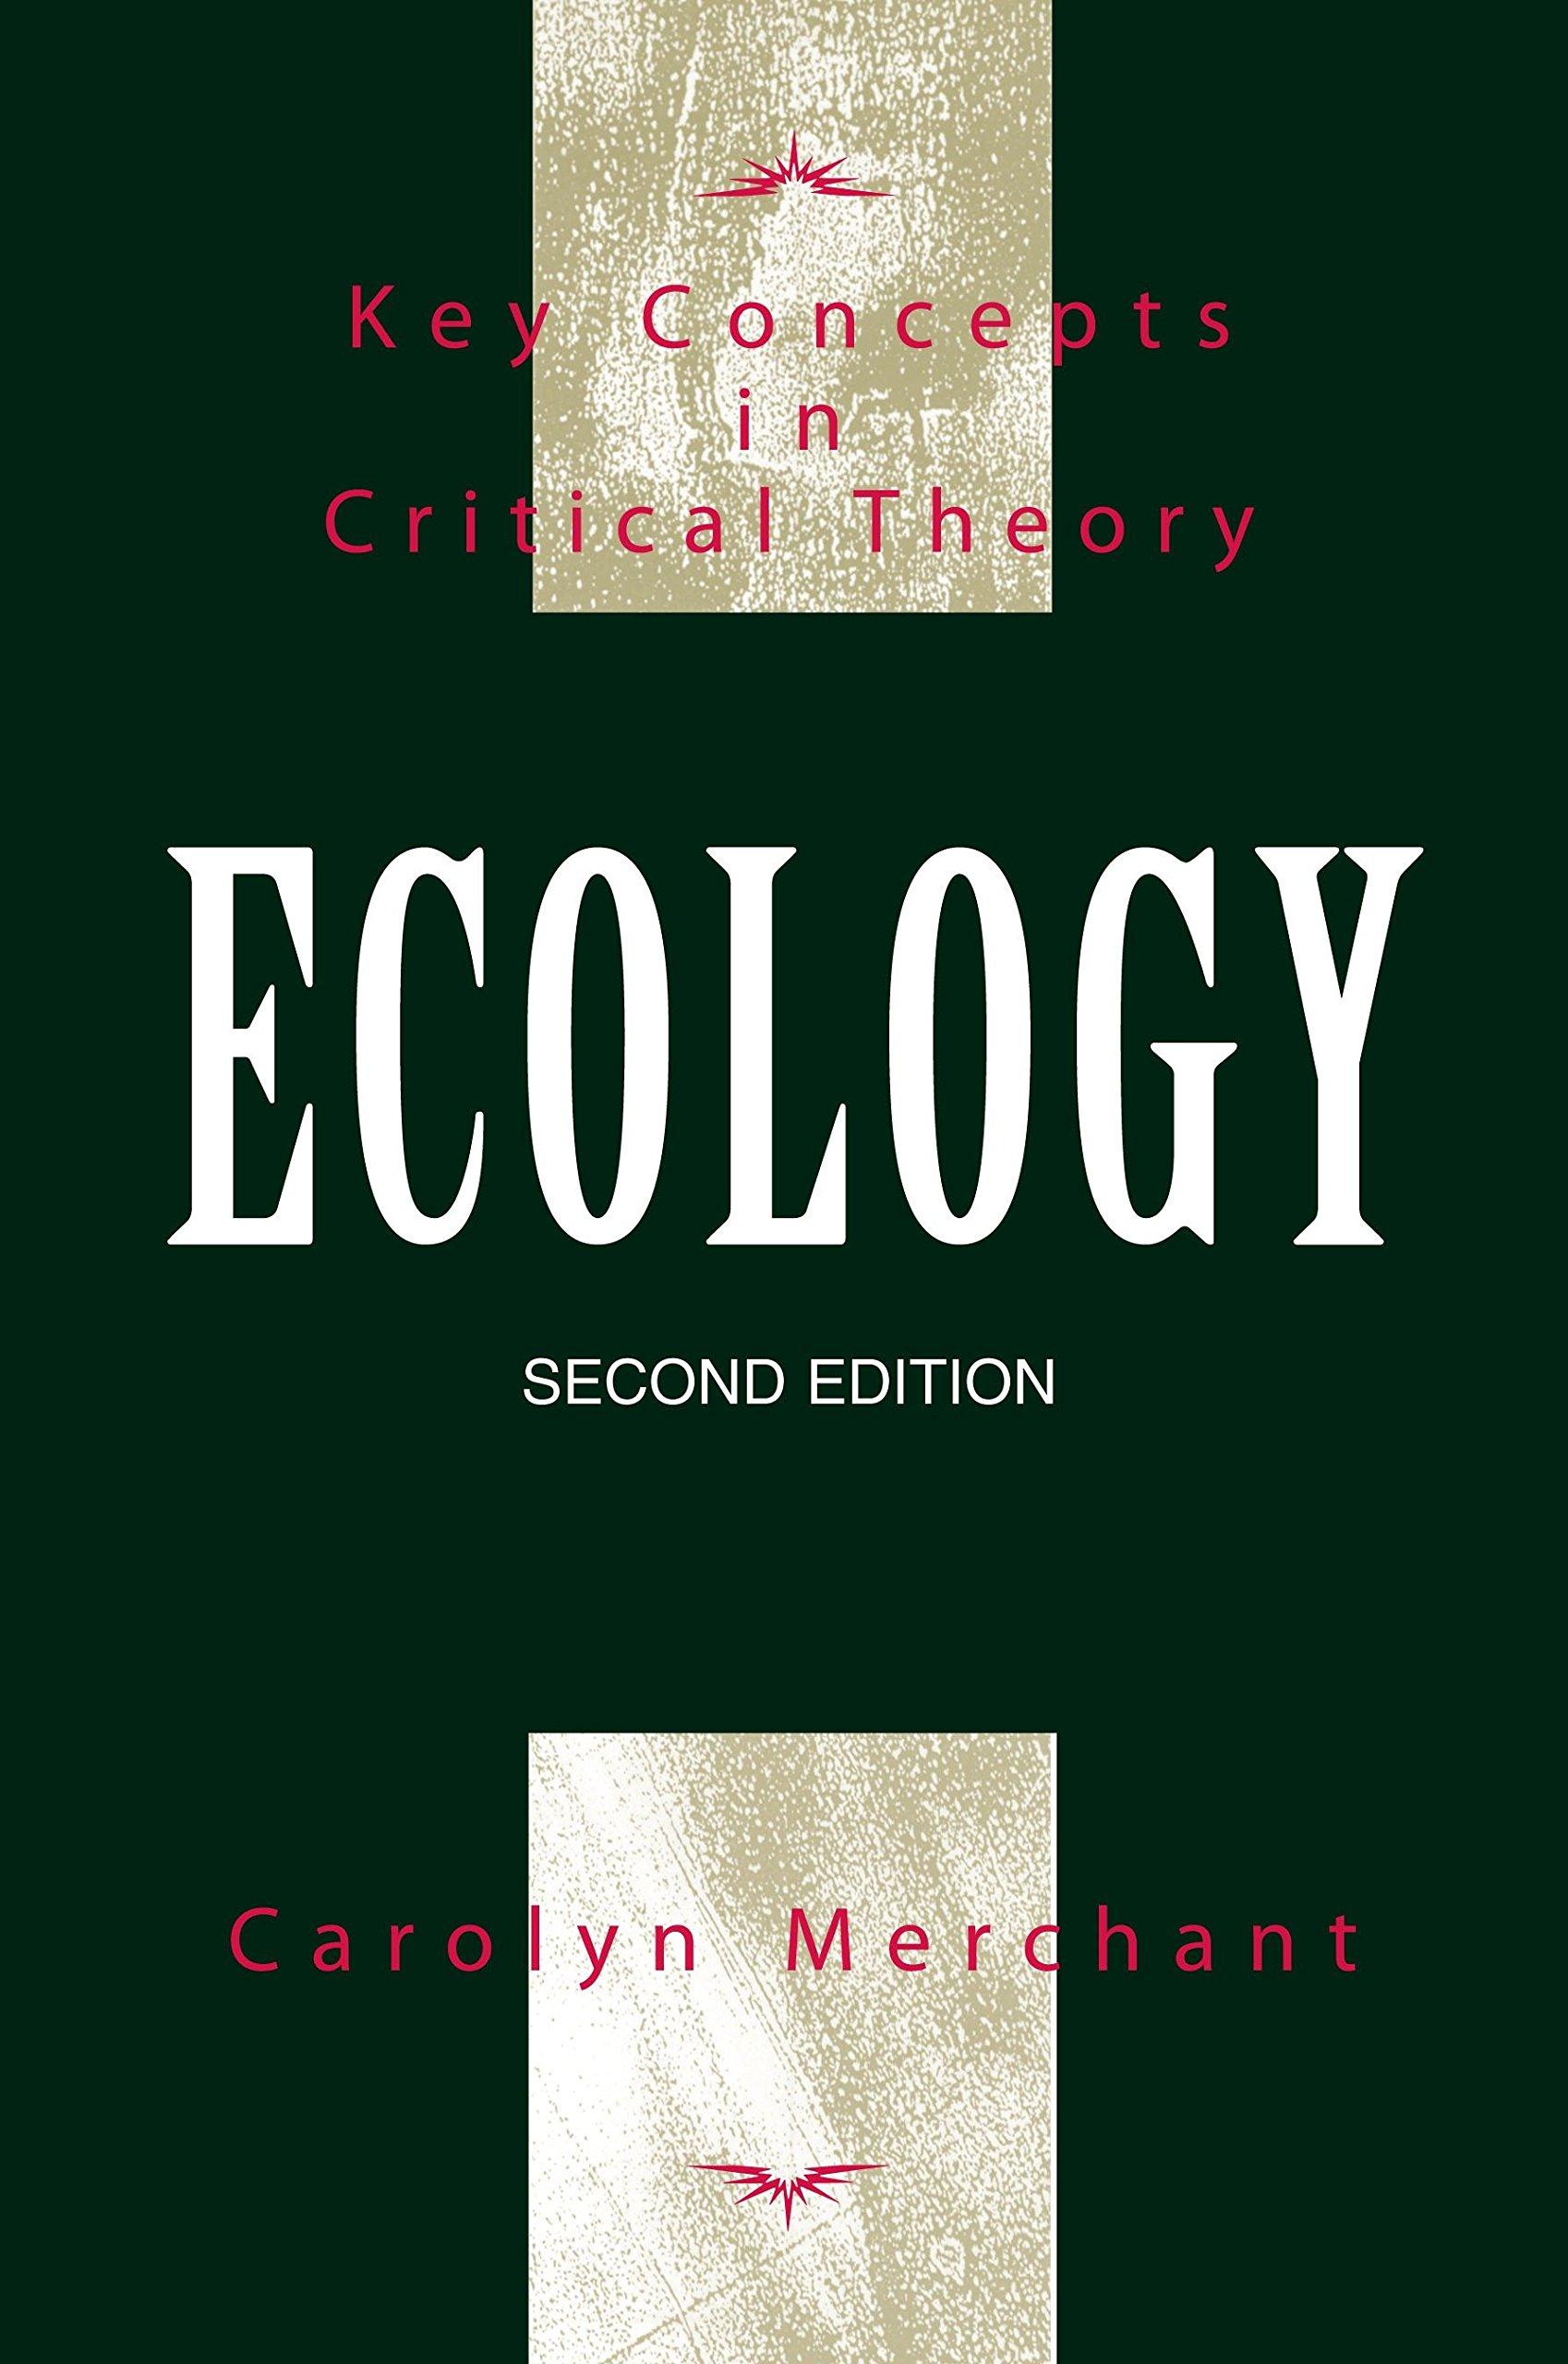 Ecology (Second Edition): Carolyn Merchant: 9781591025788: Amazon.com: Books